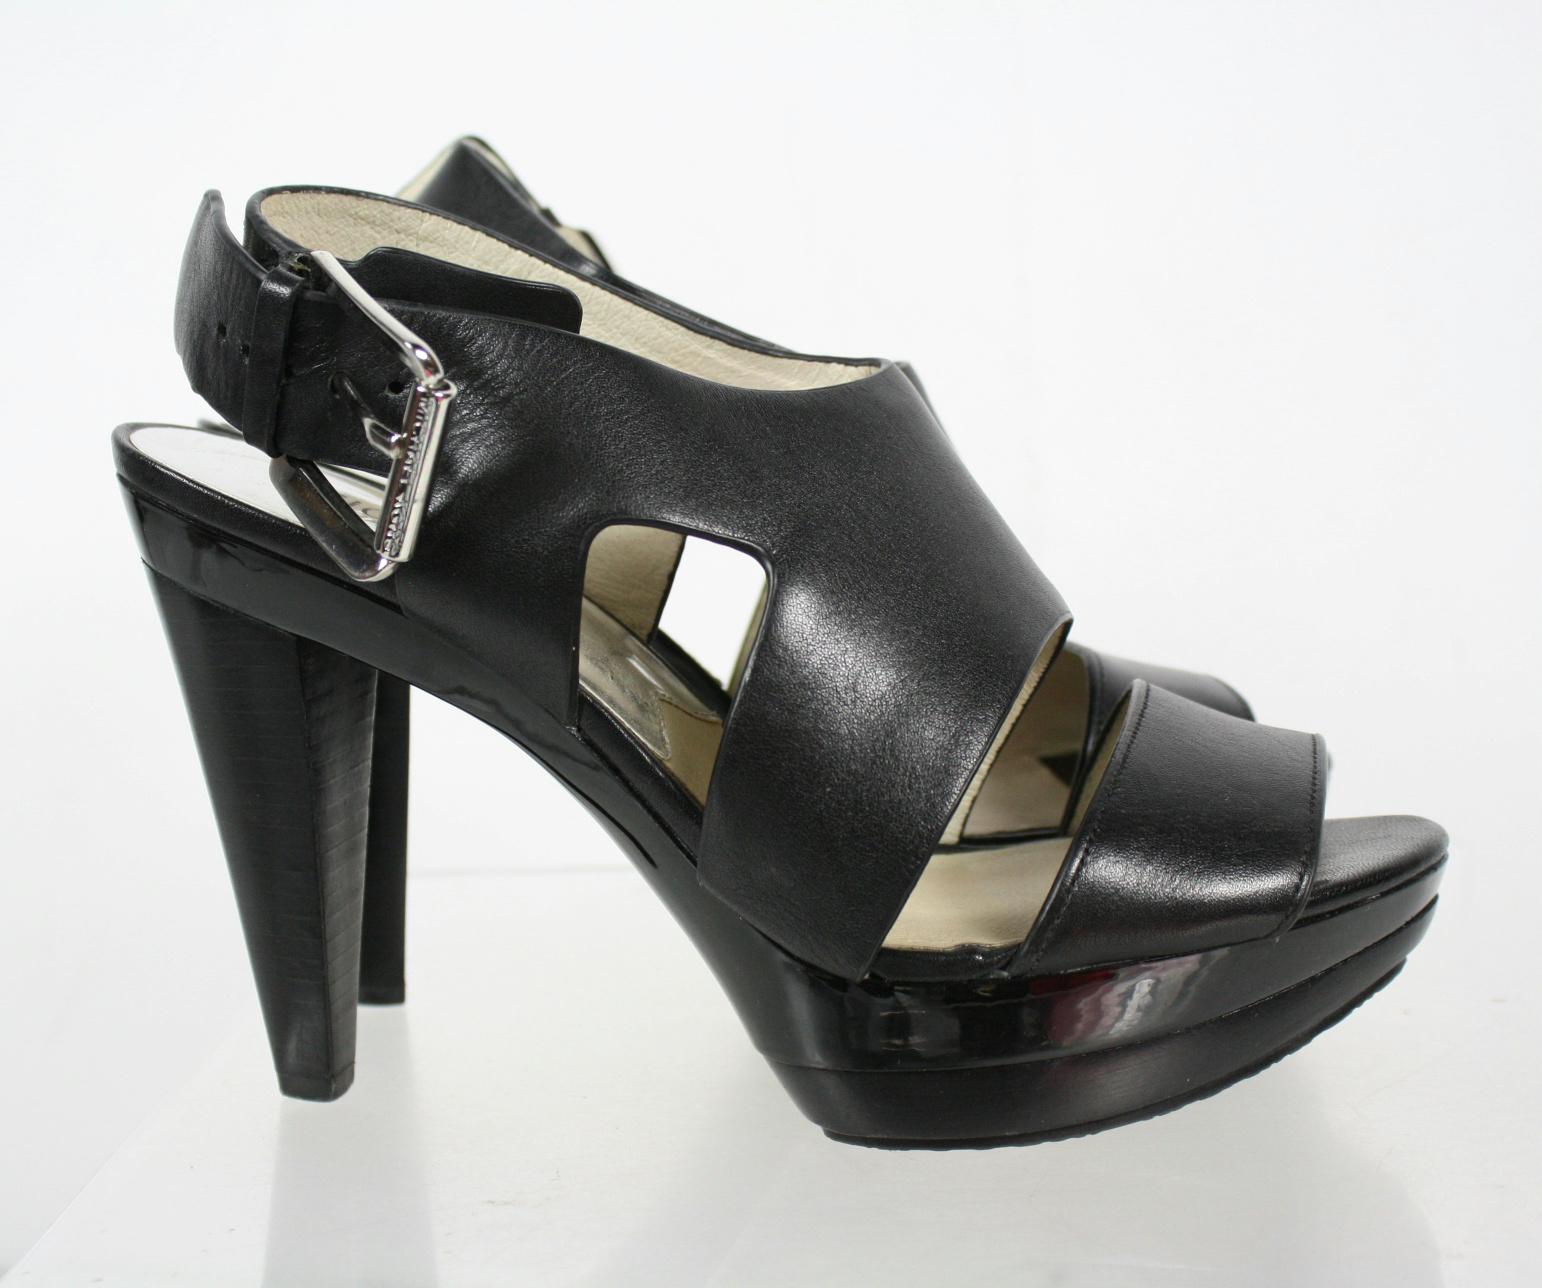 michael michael kors black buckle ankle boots size 8 5m ebay. Black Bedroom Furniture Sets. Home Design Ideas